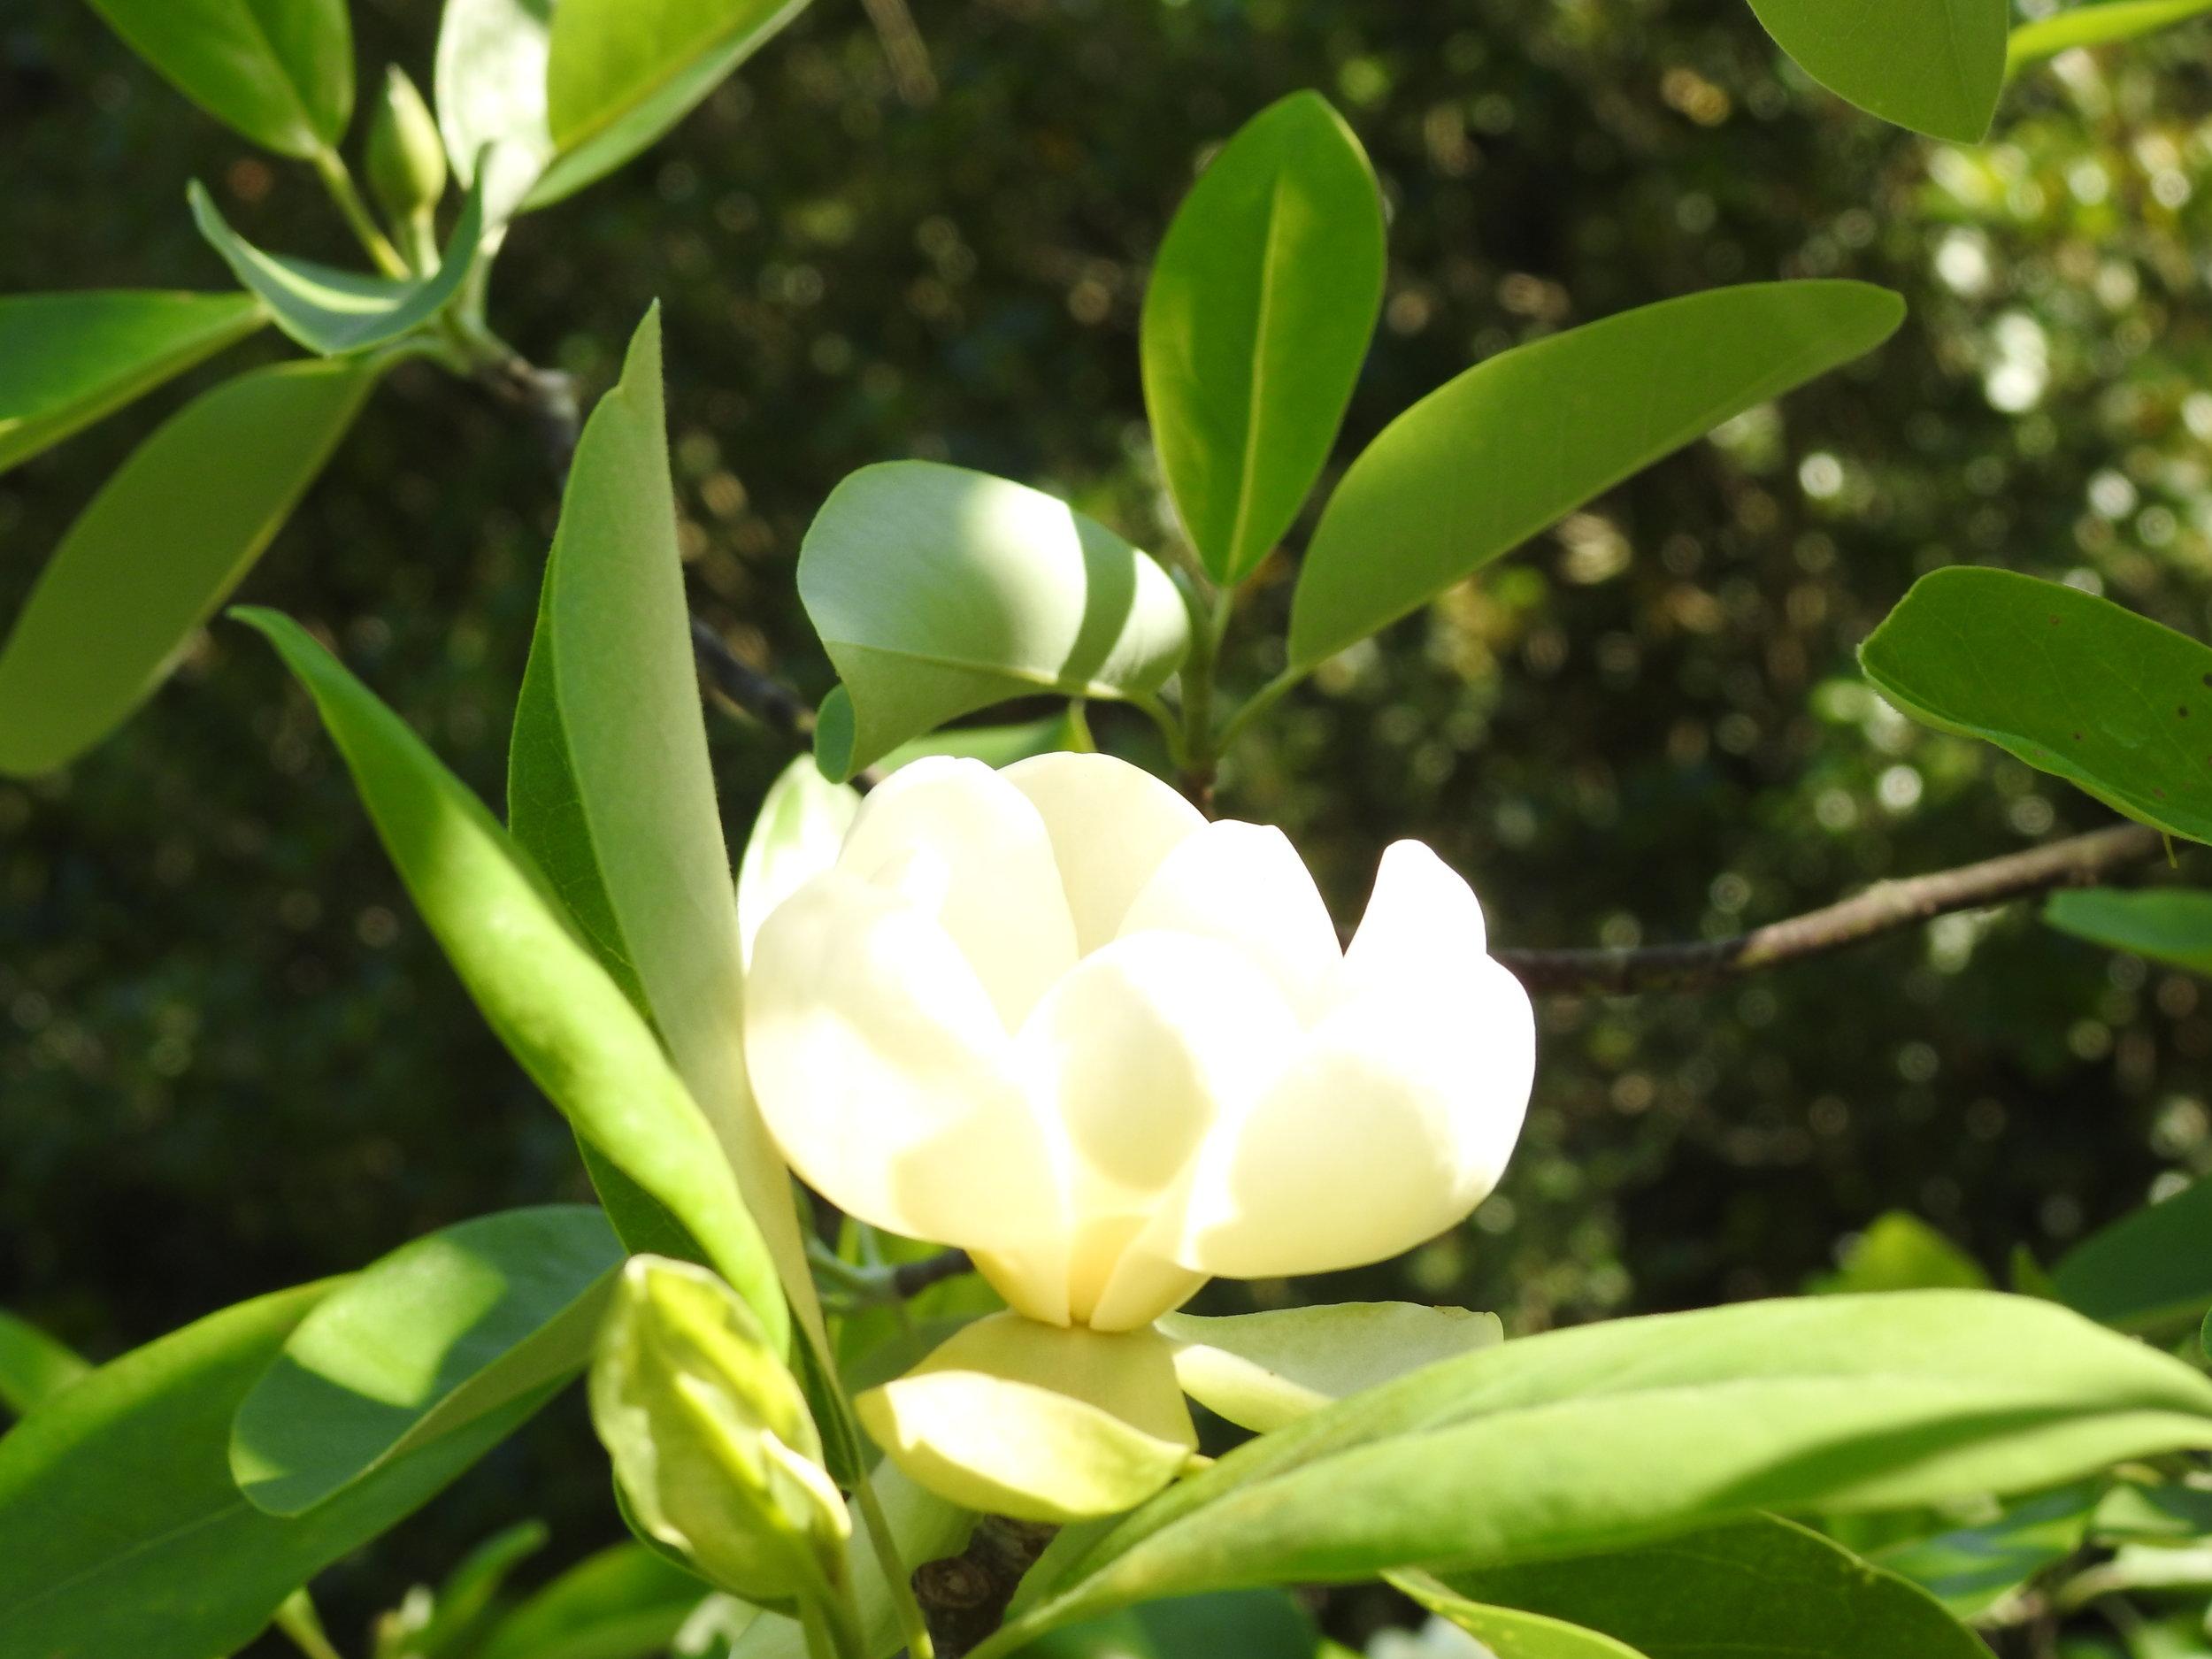 A magnolia cup of sunshine